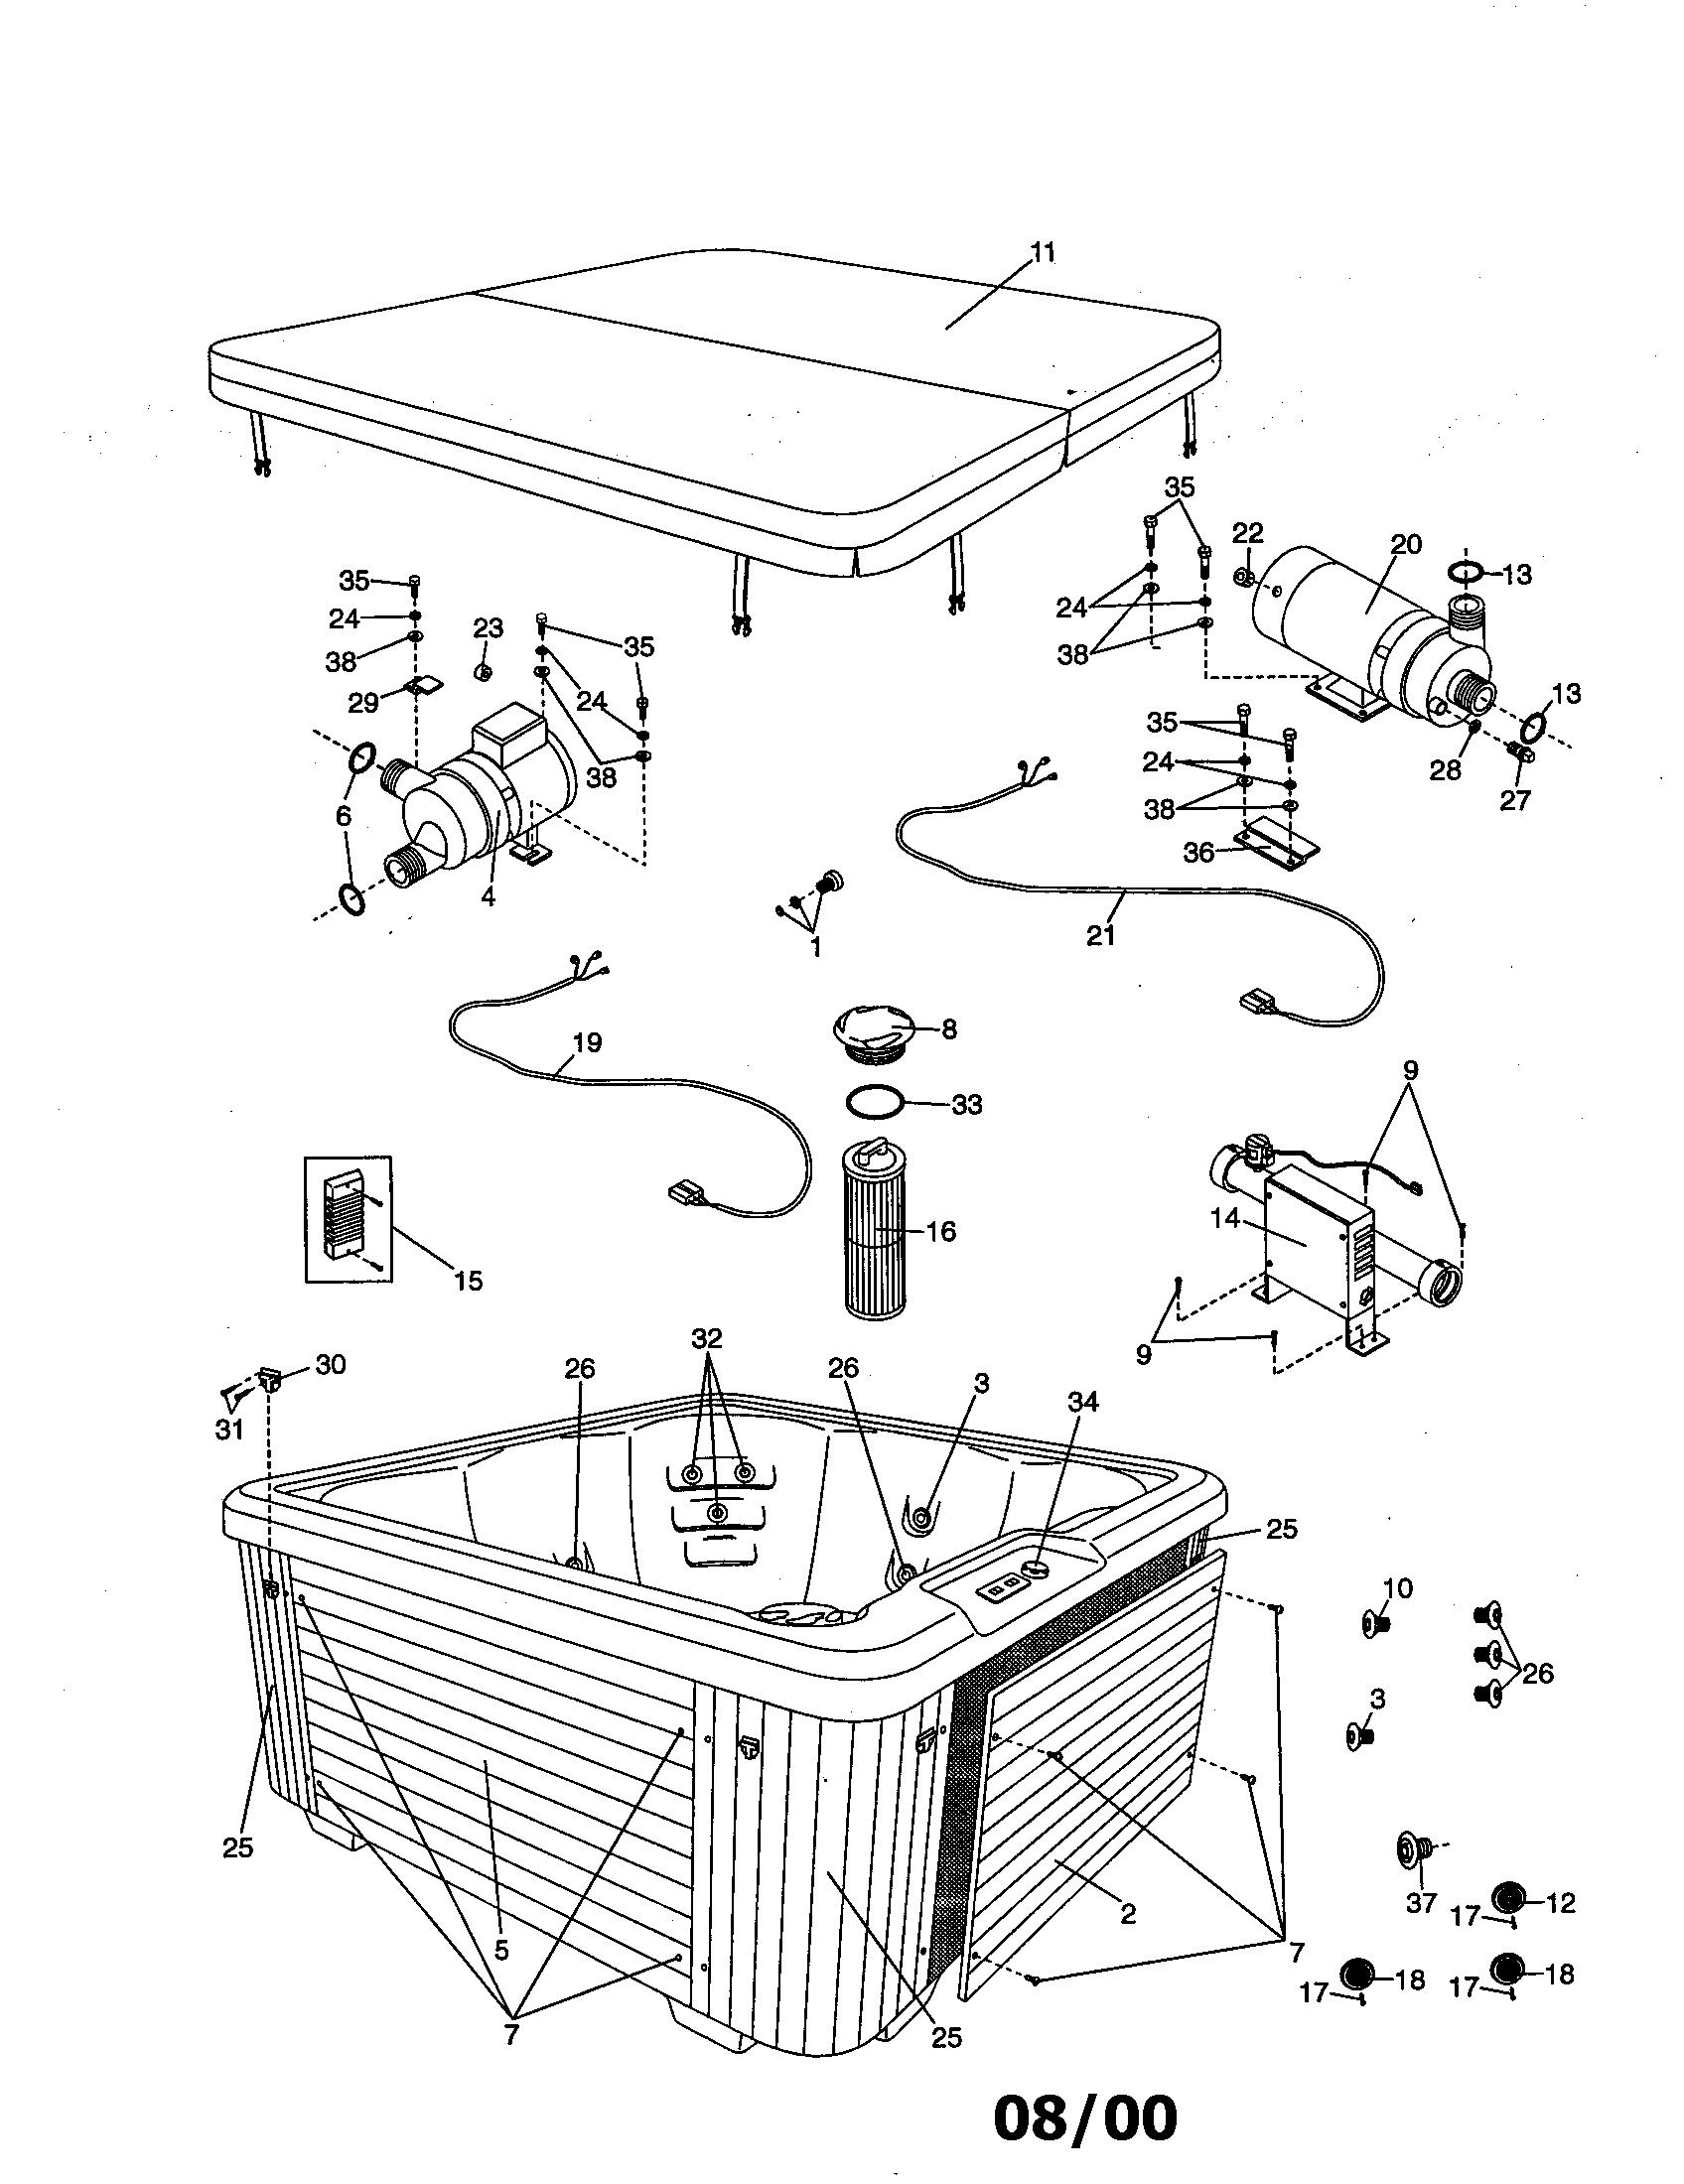 Image model 210160 spa genuine parts